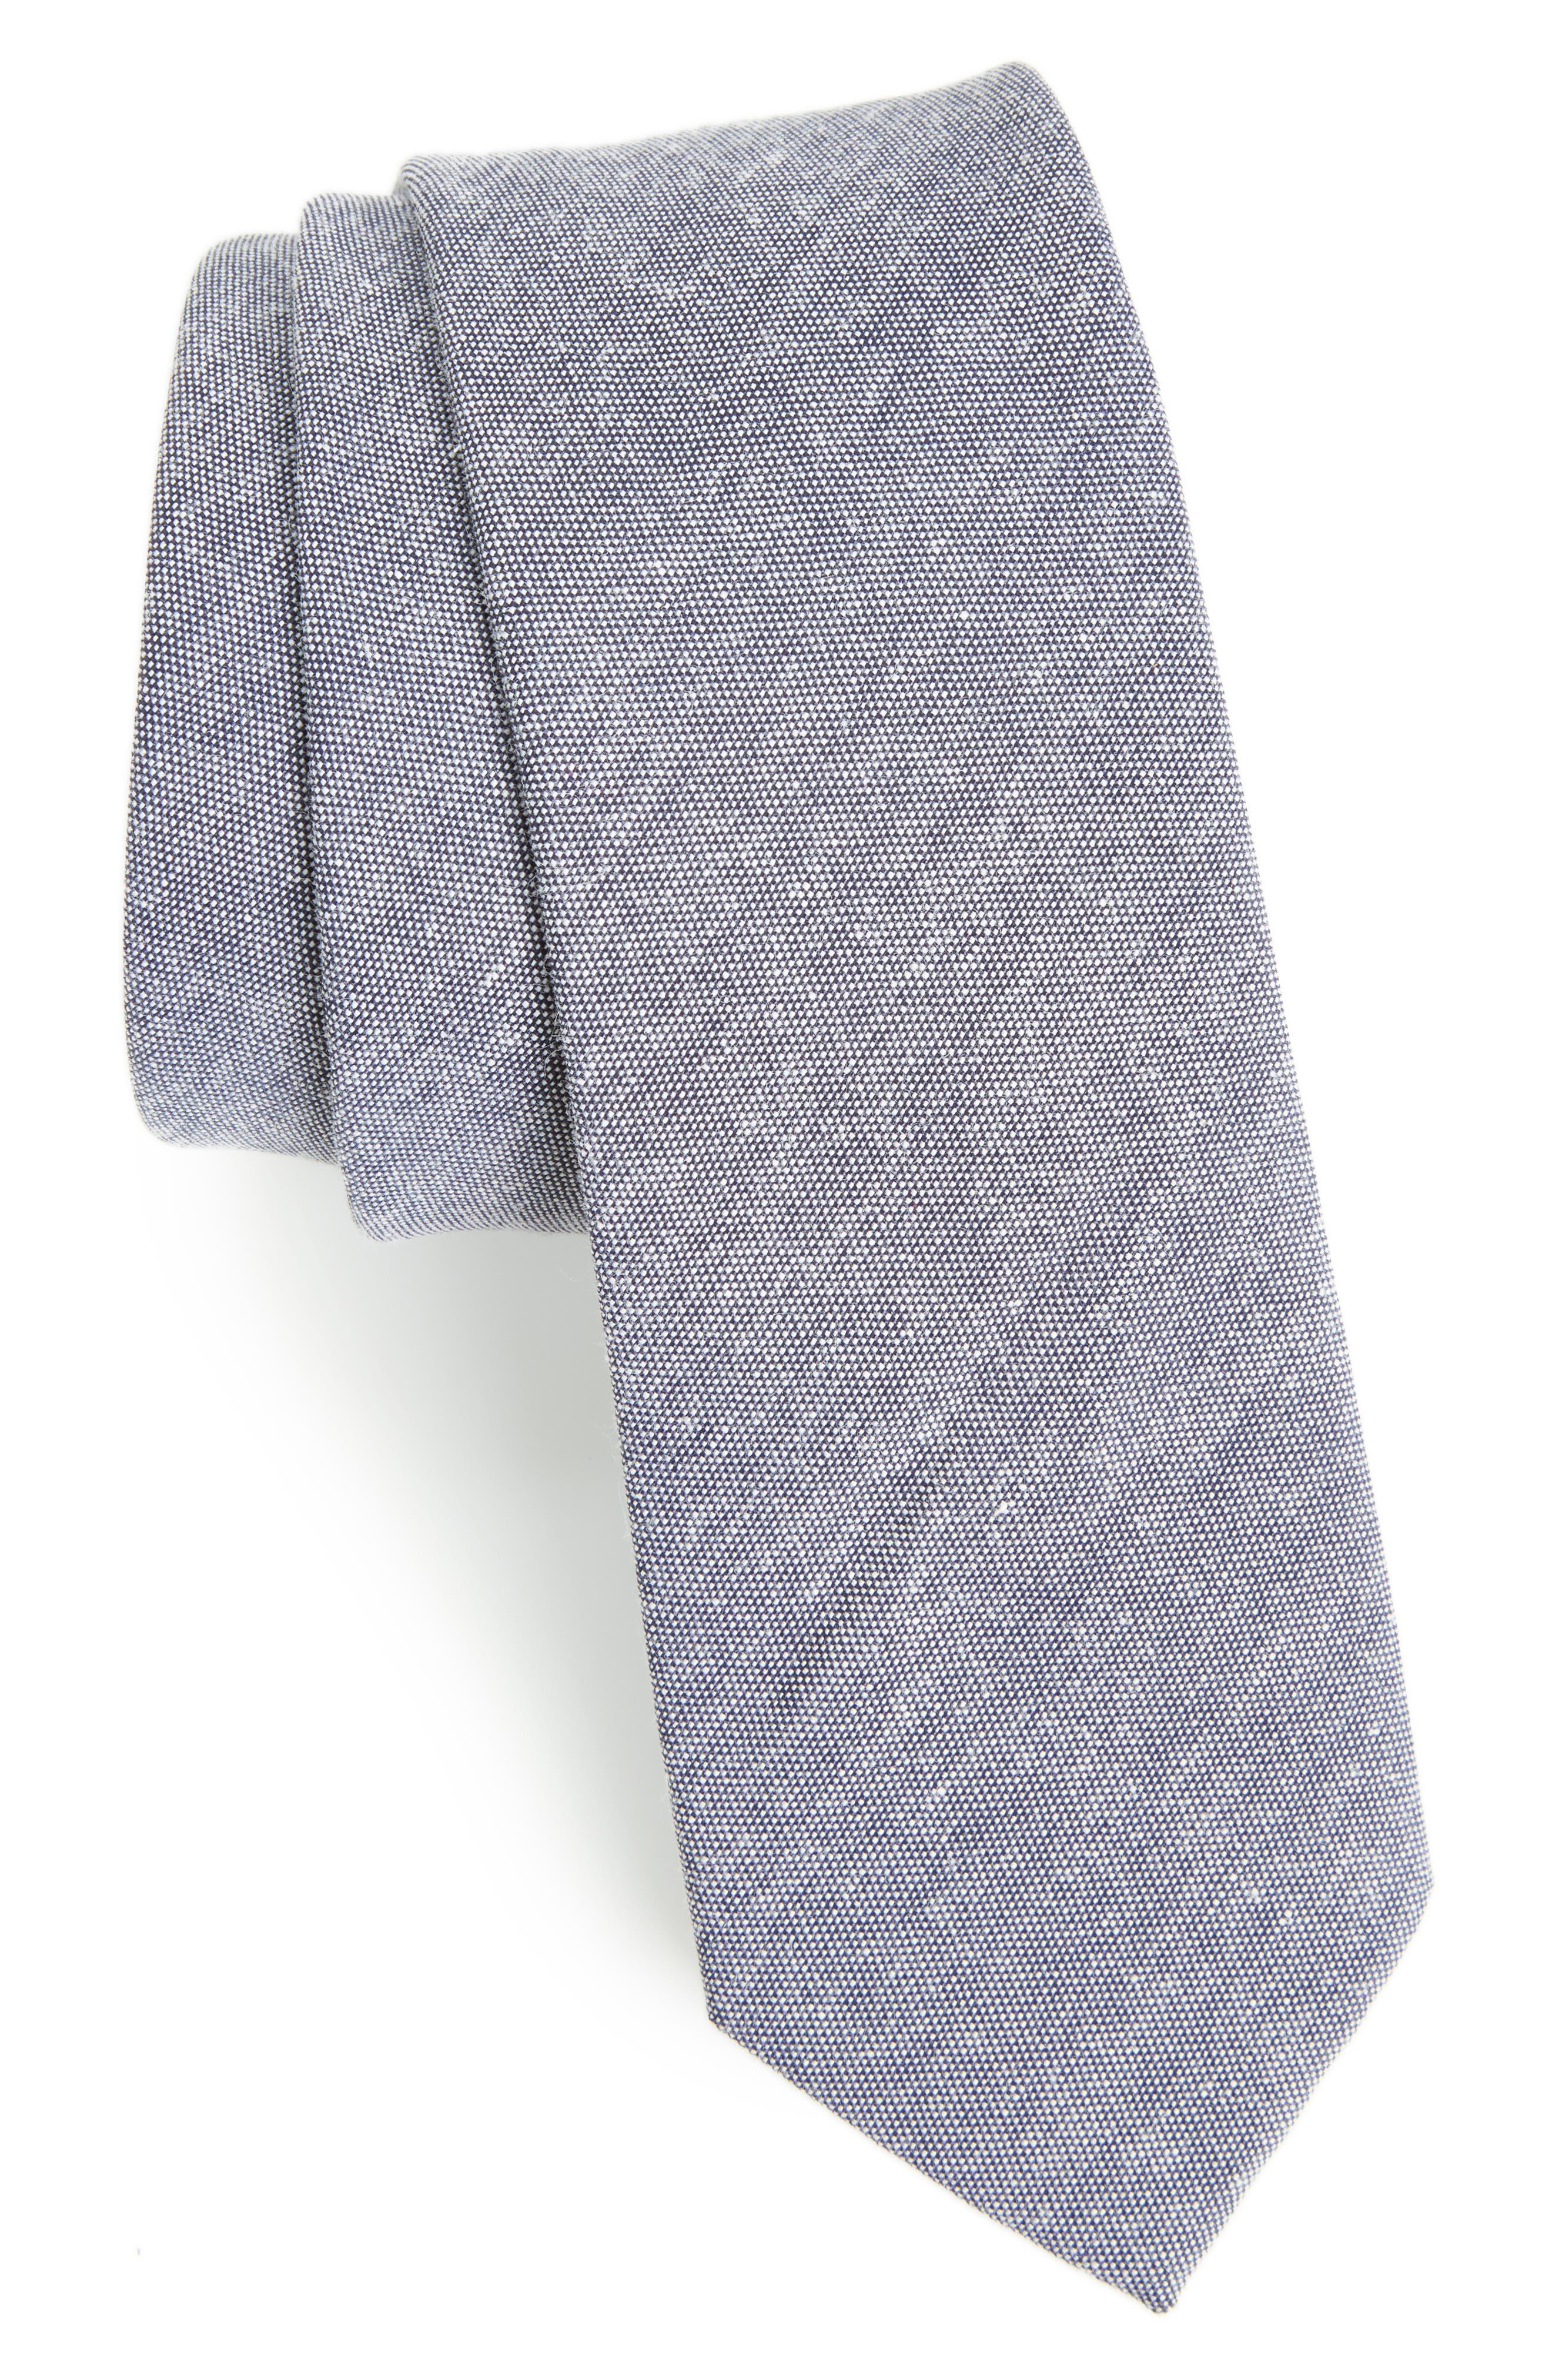 Alternate Image 1 Selected - 1901 Solid Tie